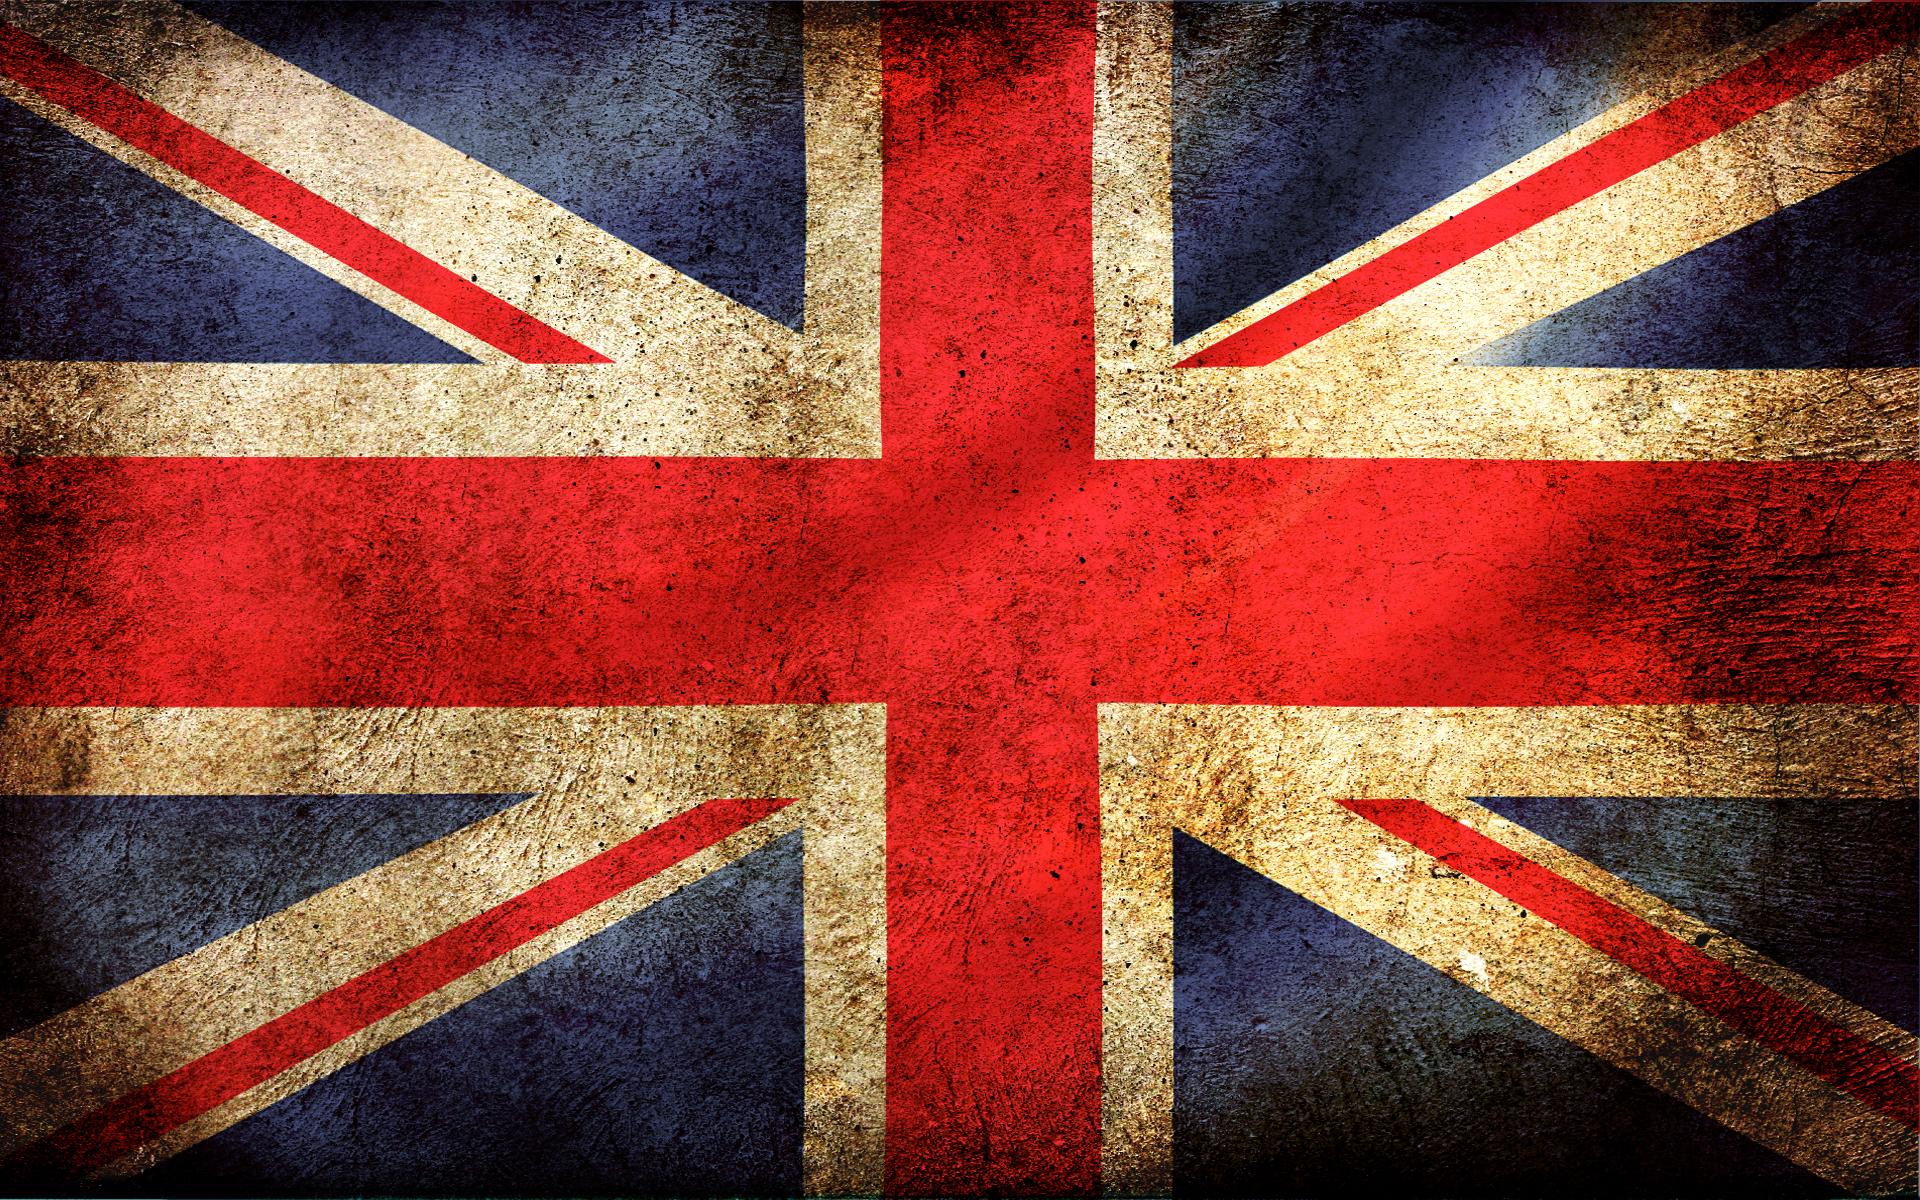 Gallery For gt Ww2 British Flag 1920x1200